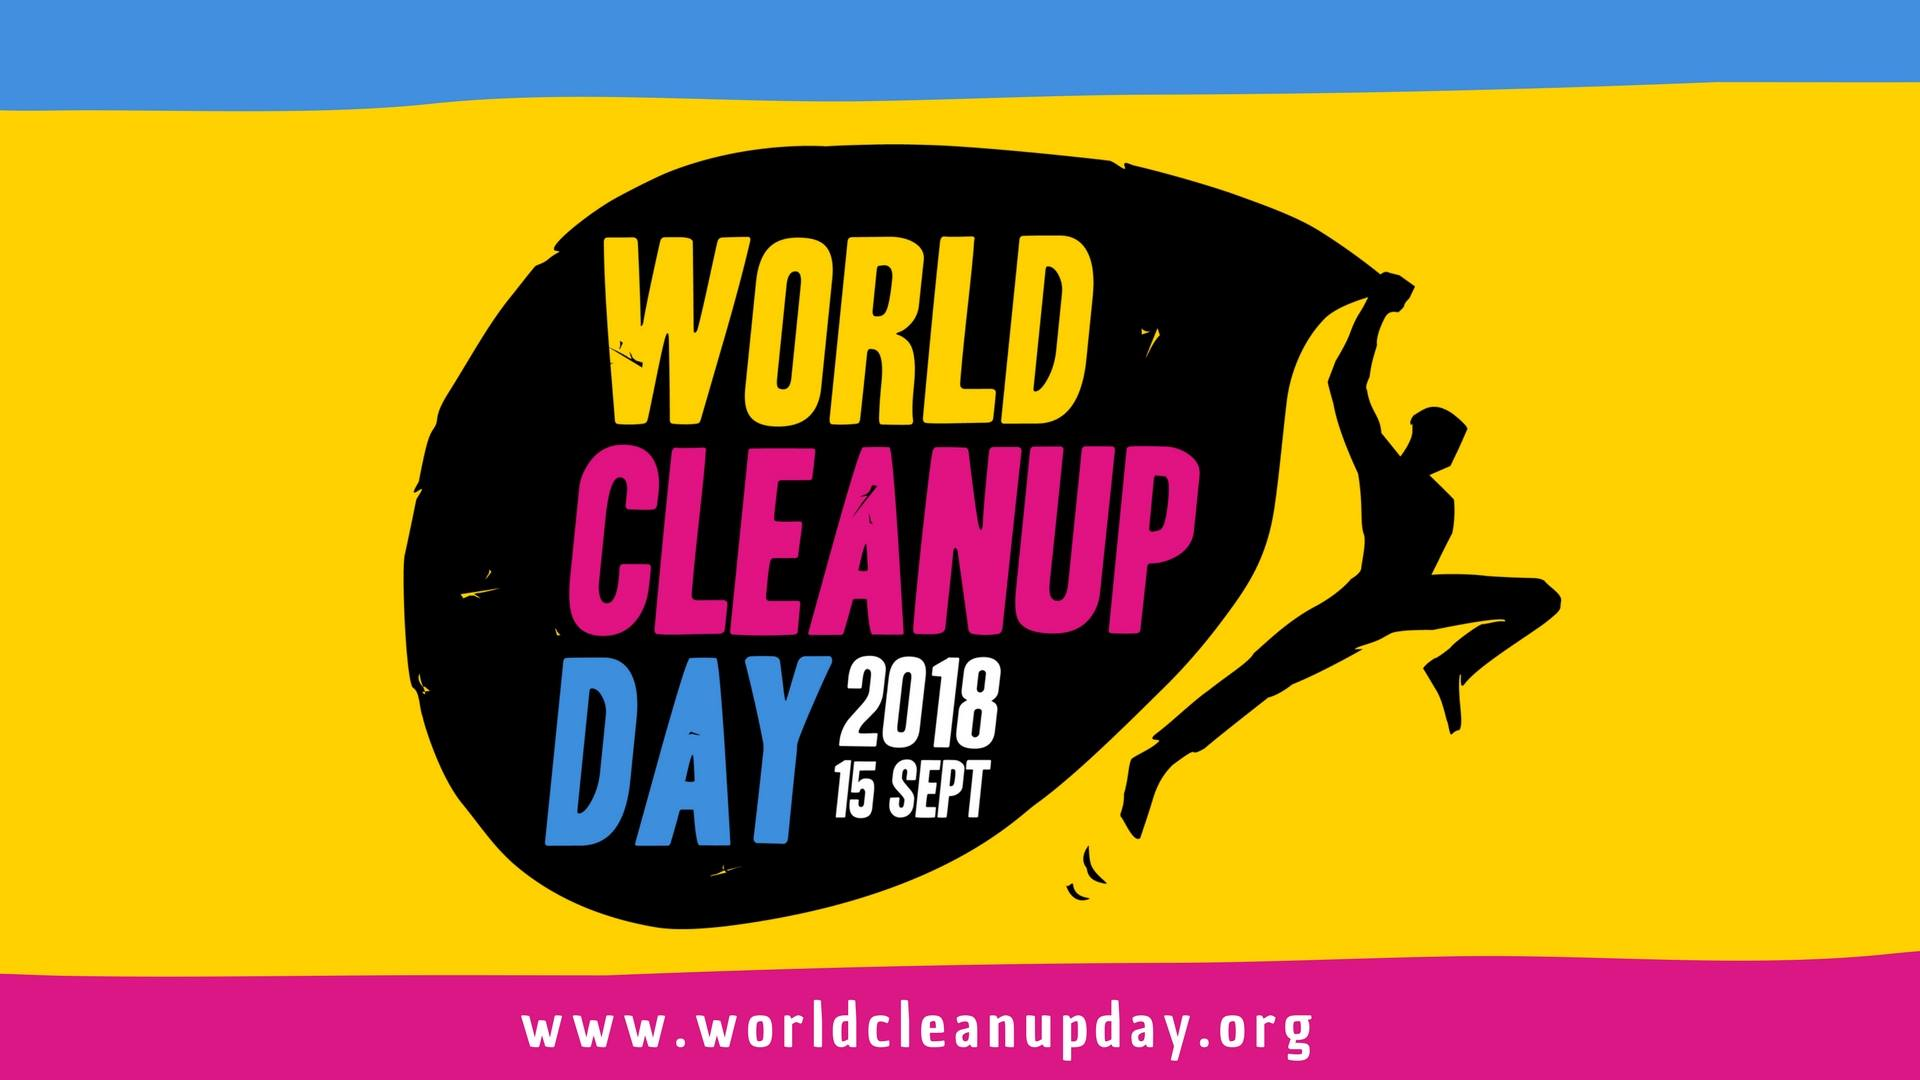 World Cleanup Day - 15 De Septiembre 2018 Imagen cedida